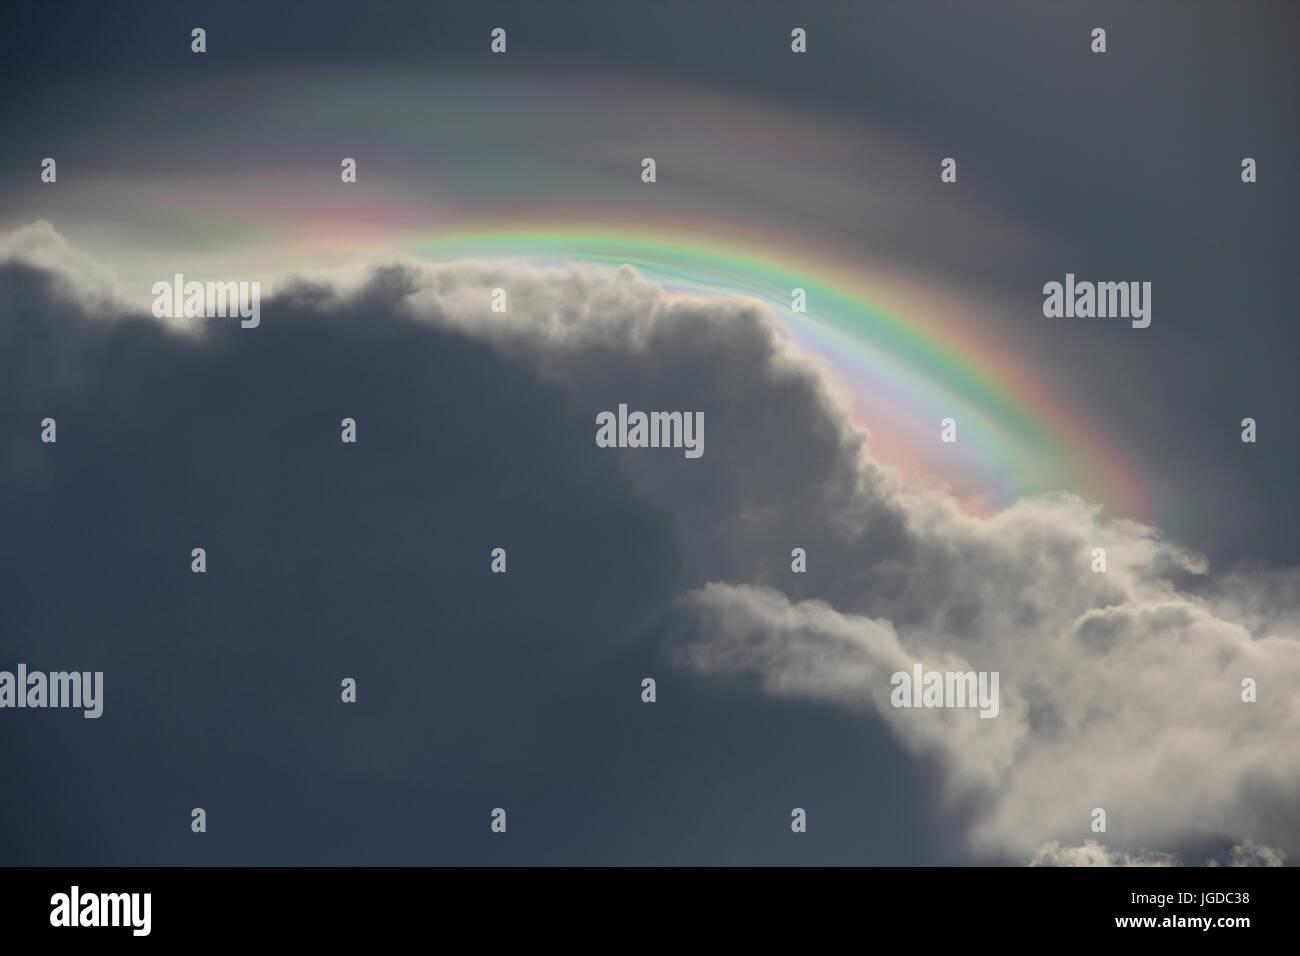 Iridescência, Nuvens. - Stock Image